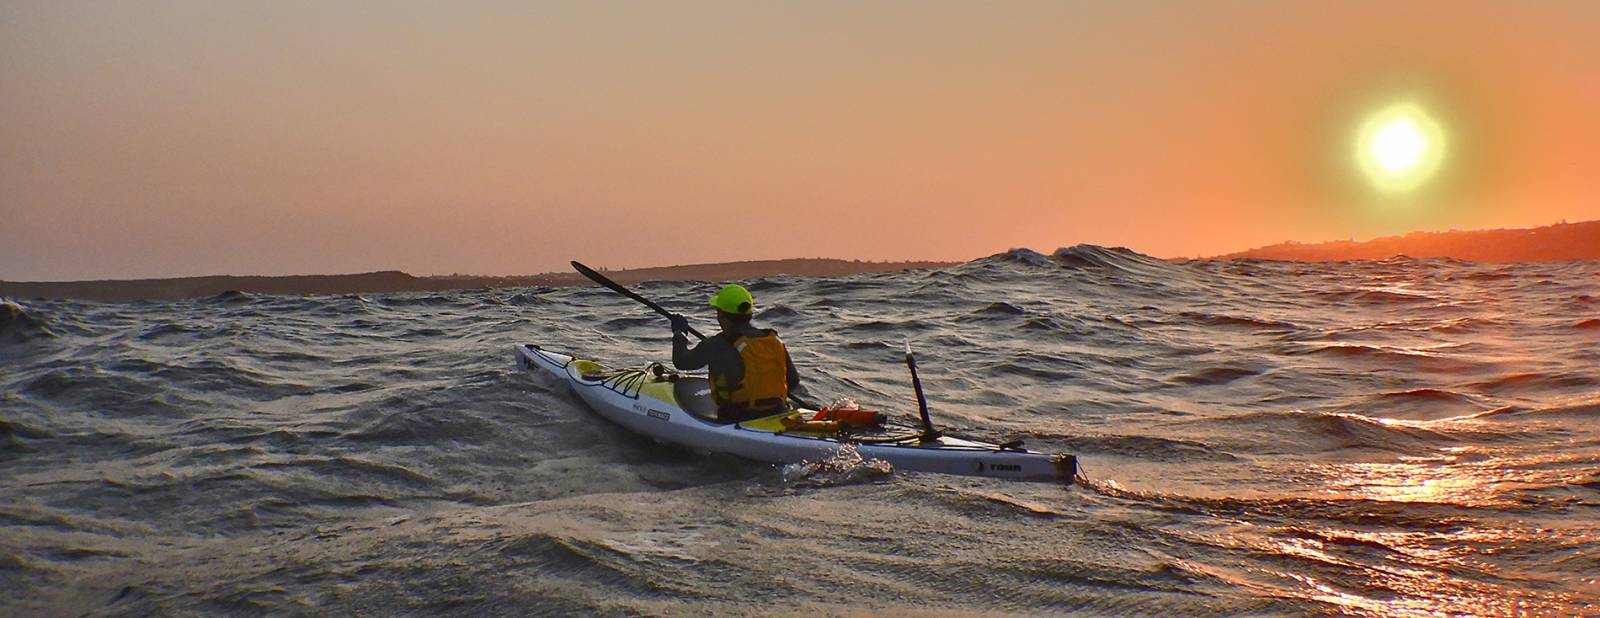 Kayaks: Pace Tour by TIDERACE Sea Kayaks - Image 4531